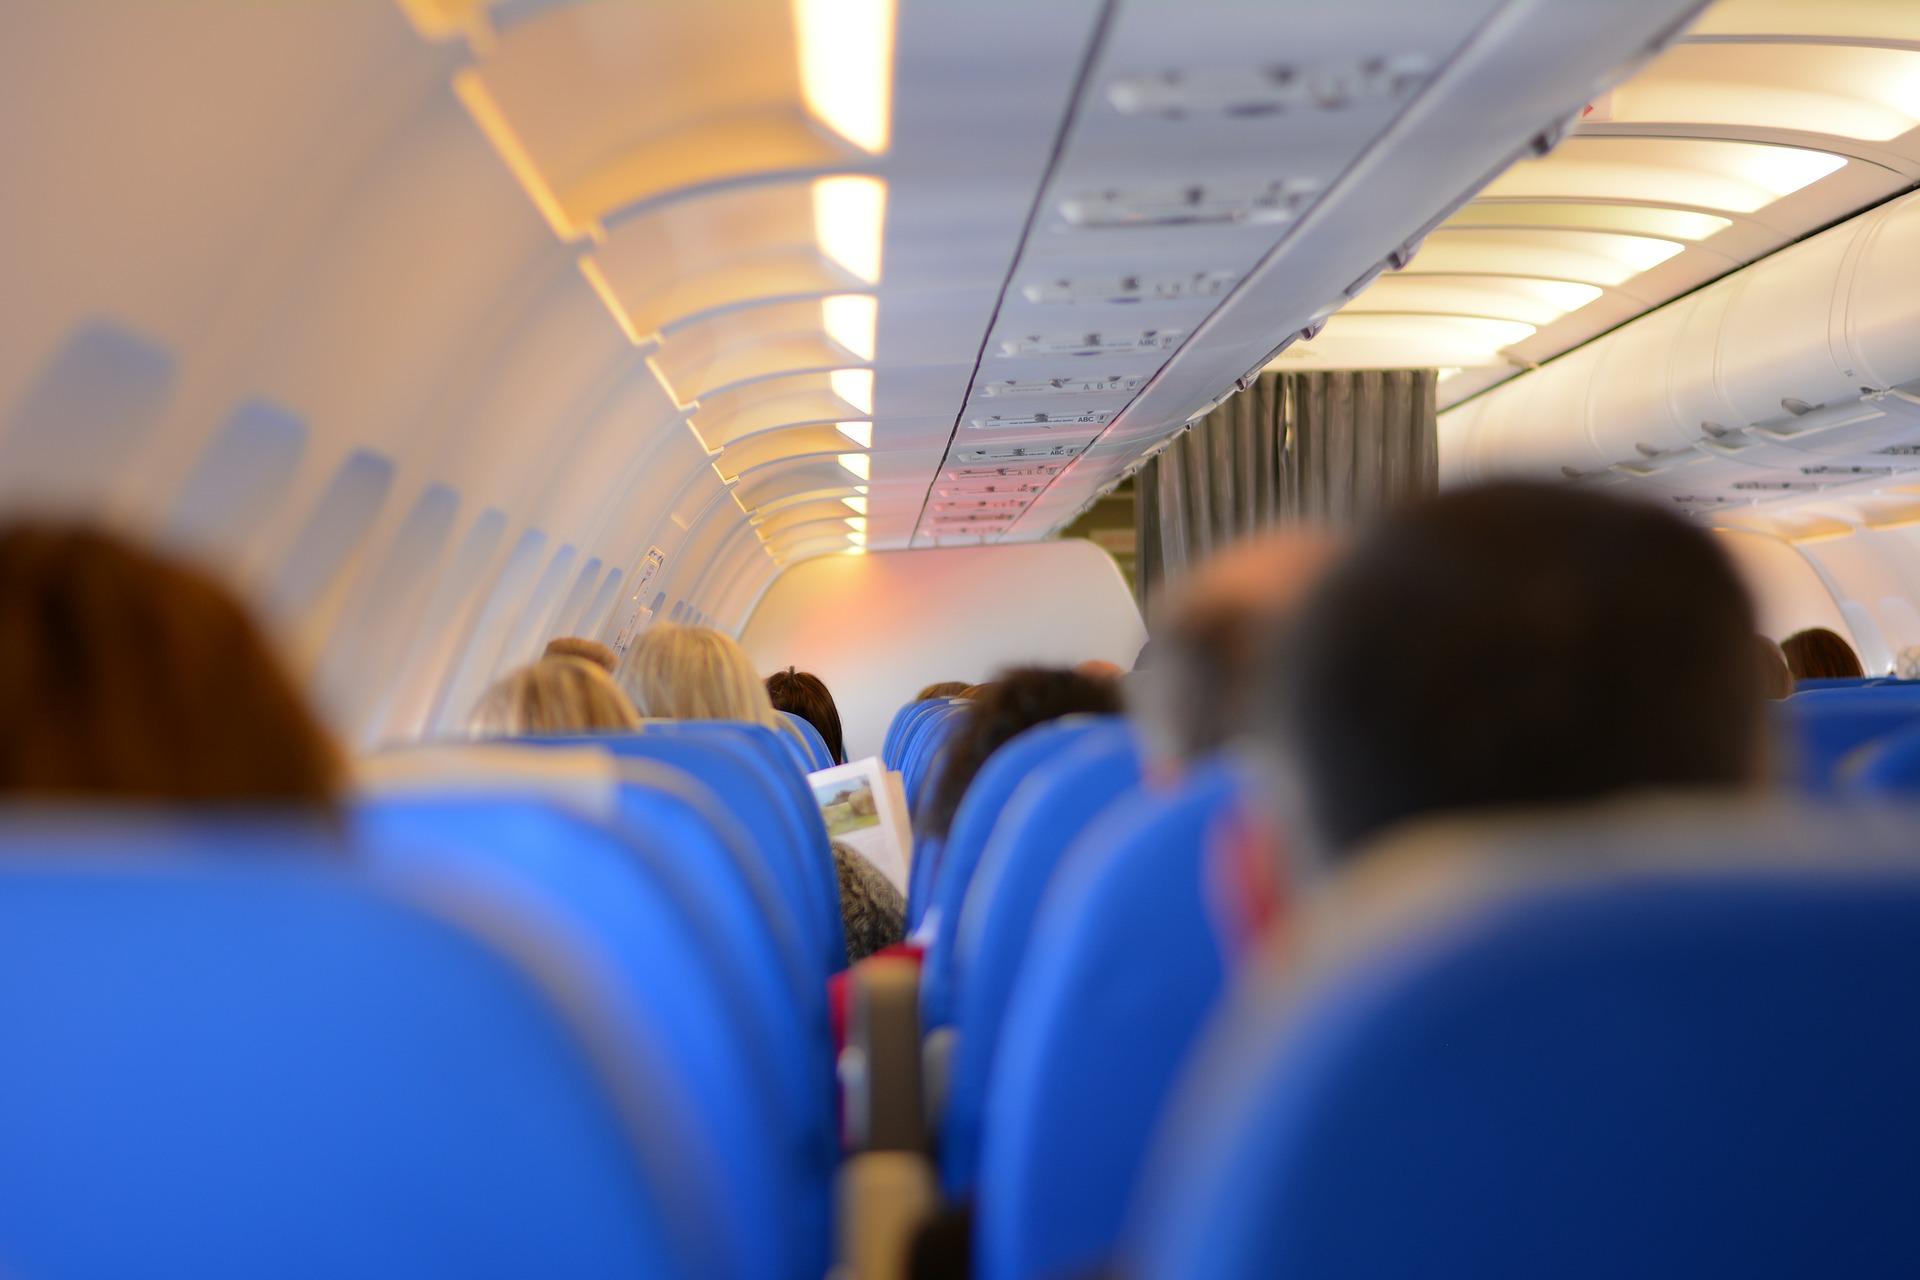 cabin, flying, plane, flight